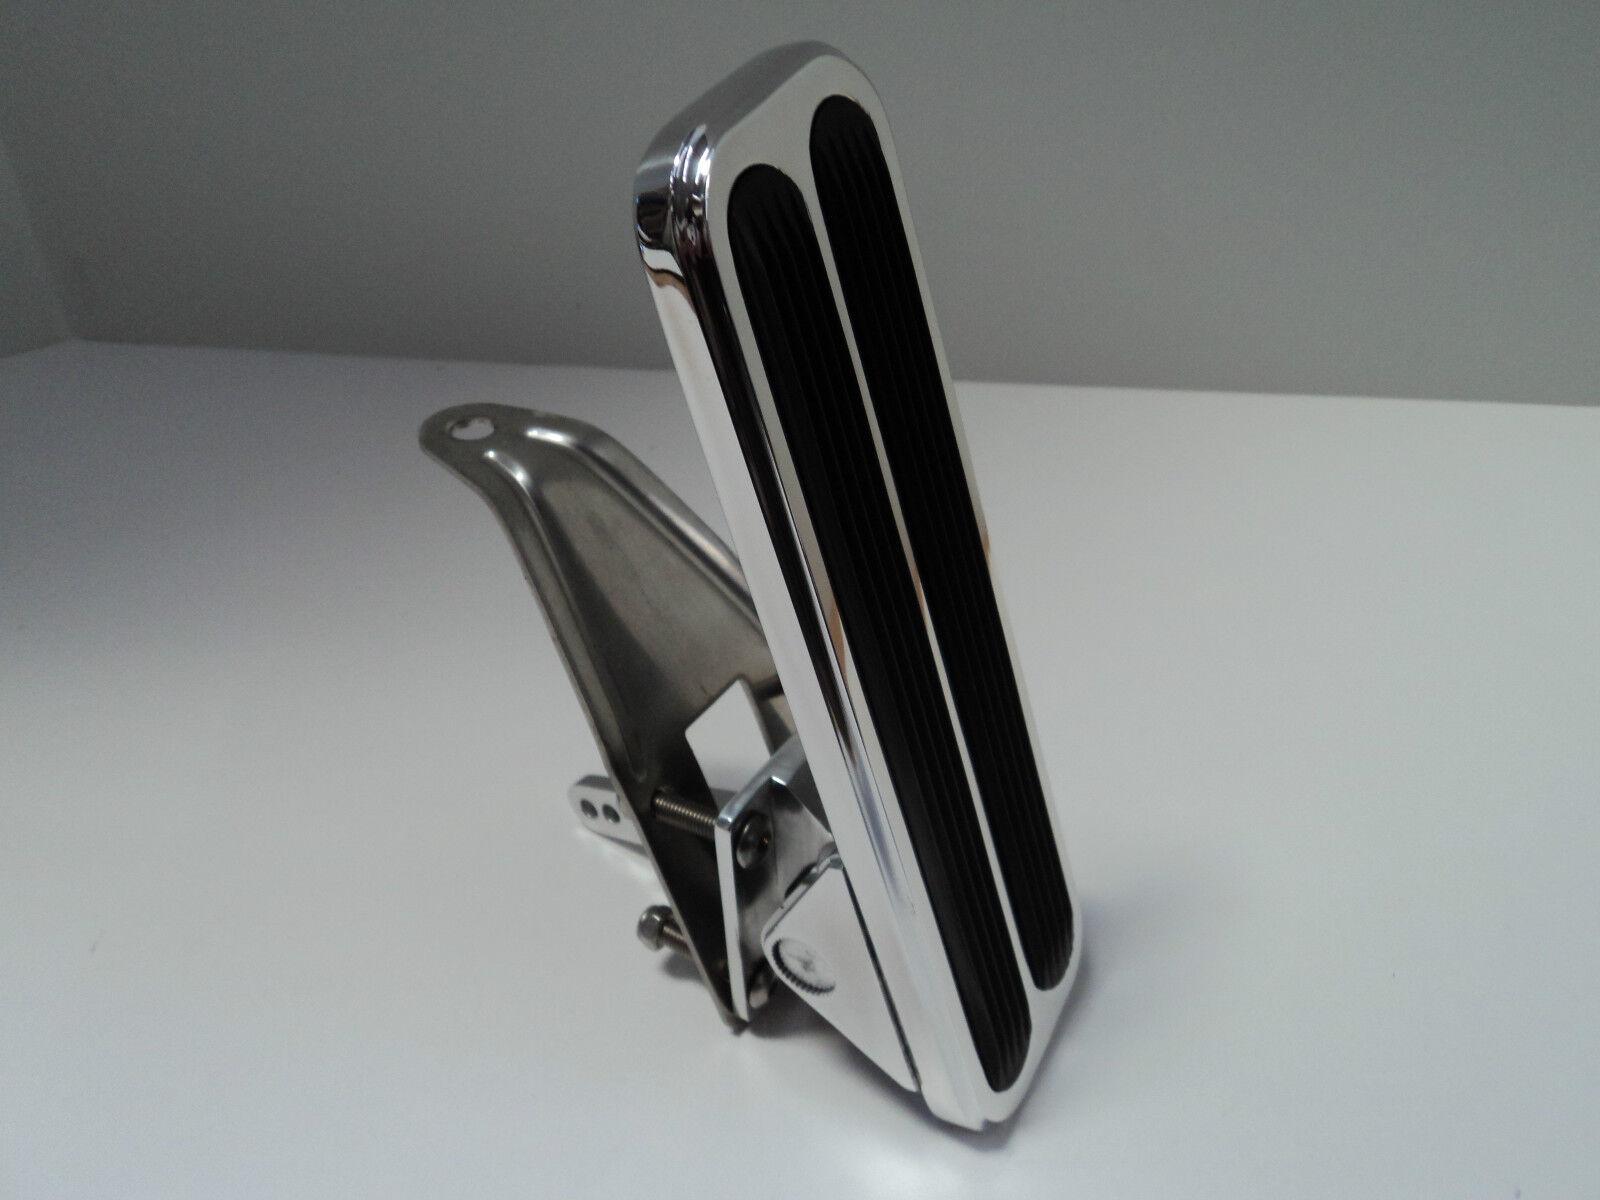 Knüppel Poliertes Aluminium Bodenmontage Gas Gaspedal Chevy Ford Ford Ford Mopar Sbc 350  | Hohe Sicherheit  c1ce9a